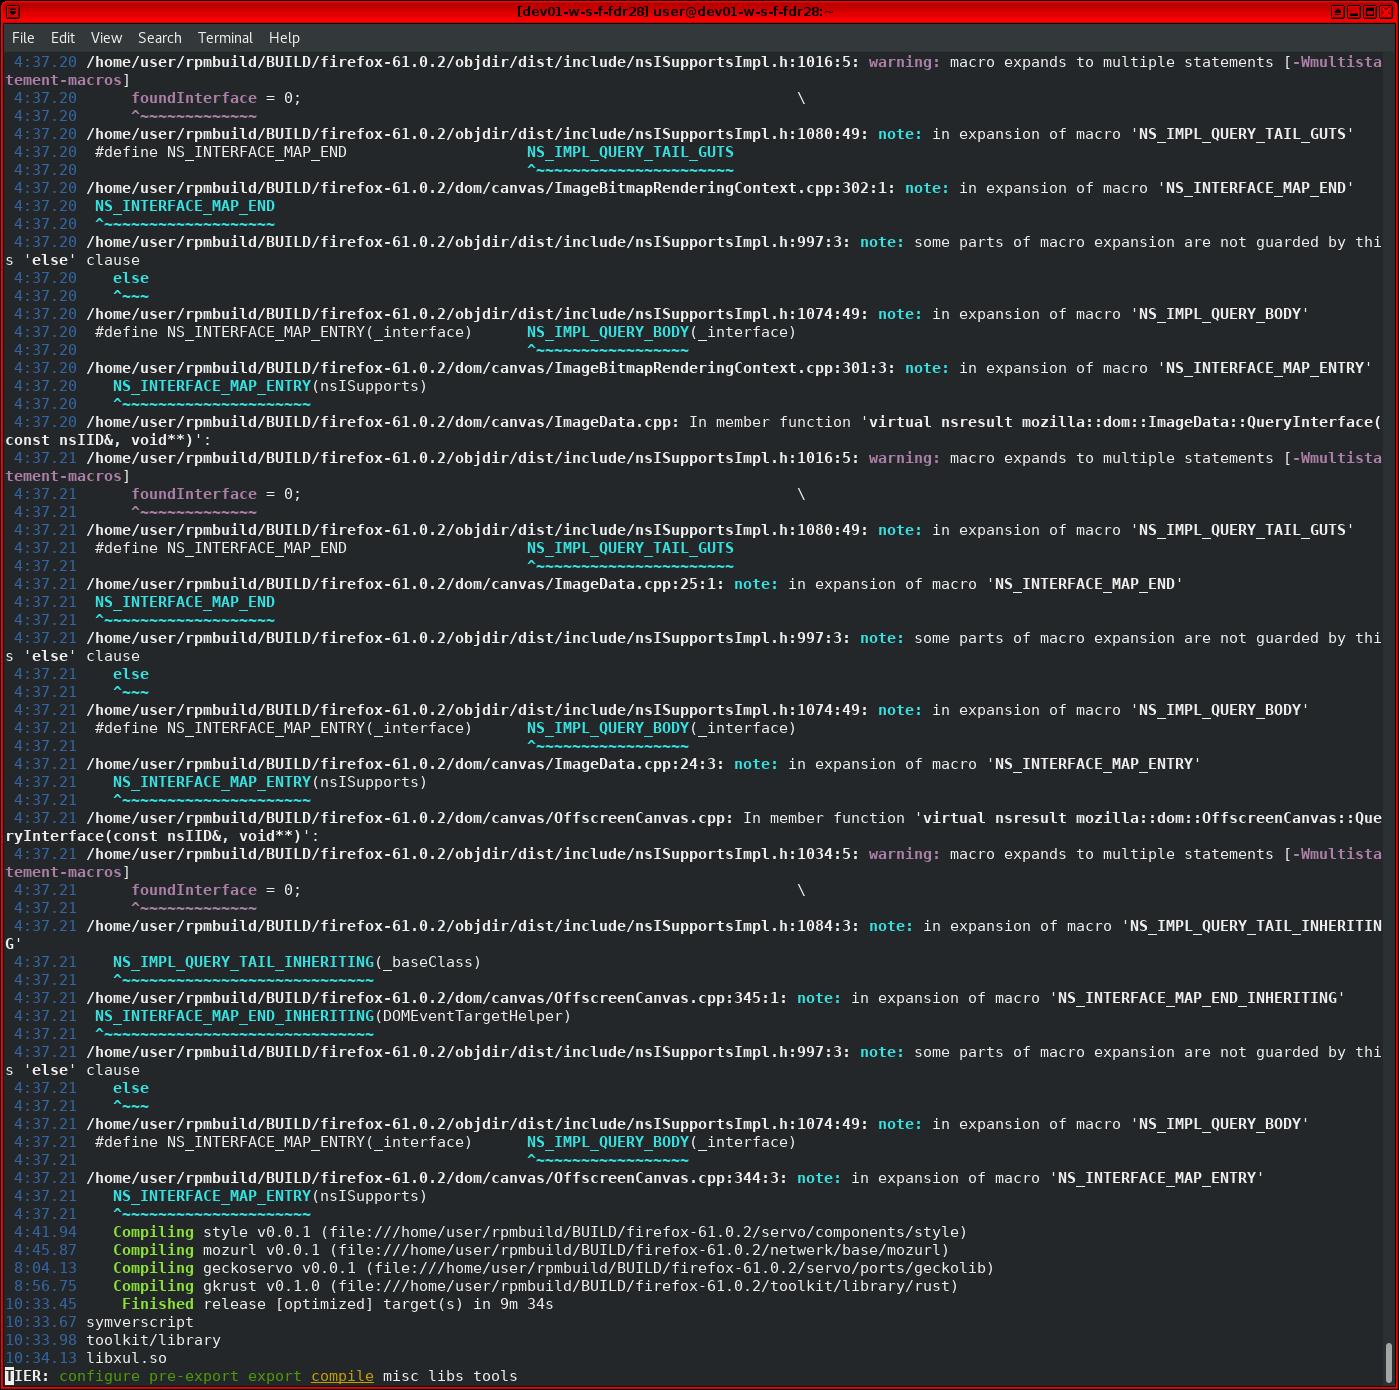 4gfroze_ffcompile_screenshot_2018-08-18_19-02-48